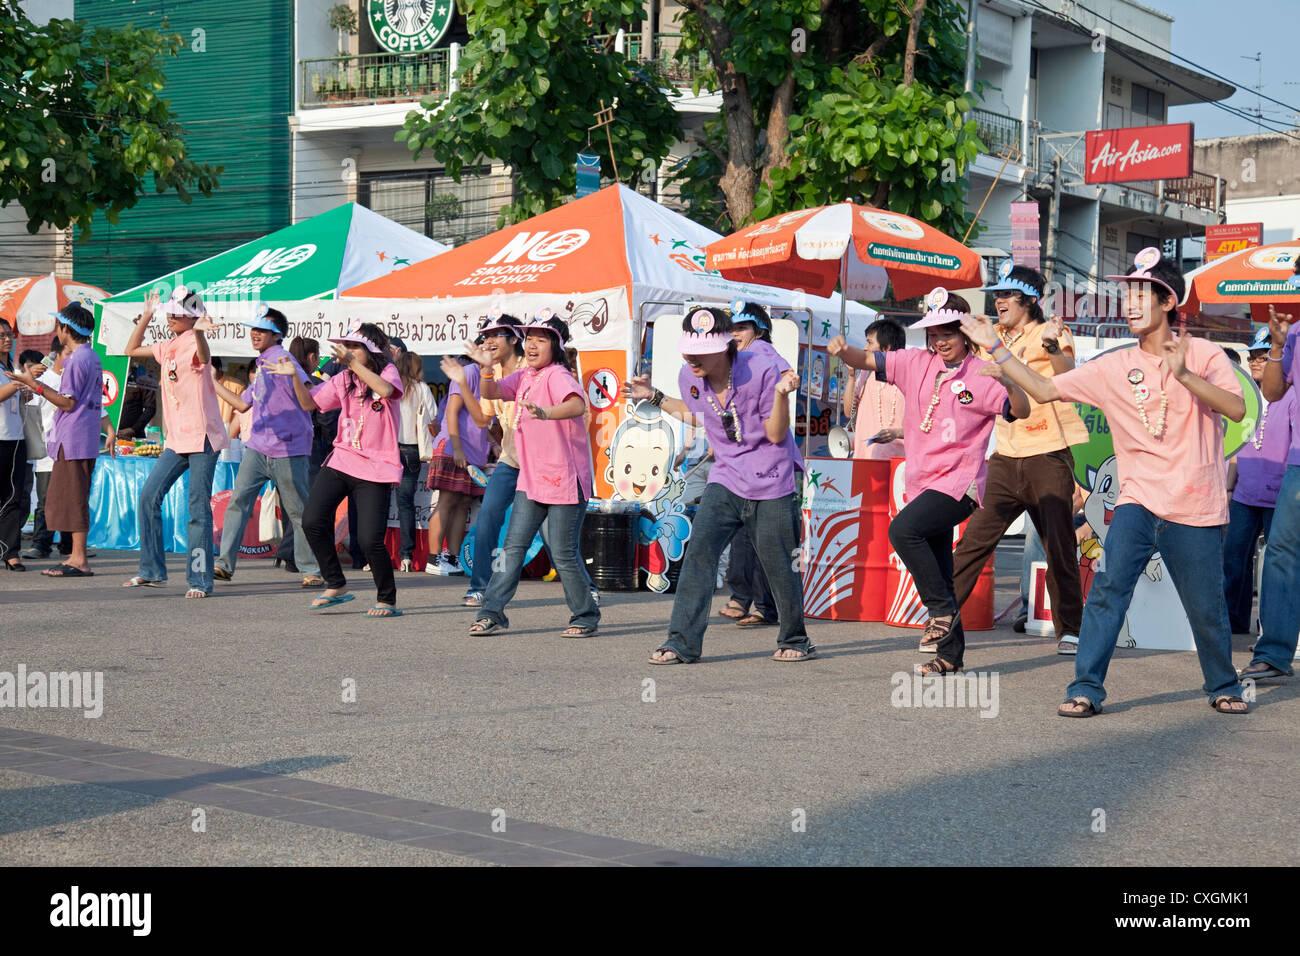 Dancing protestors (promoting reduced alcohol and cigarette consumption), Pratu Tha Phae, Chiang Mai, Thailand - Stock Image